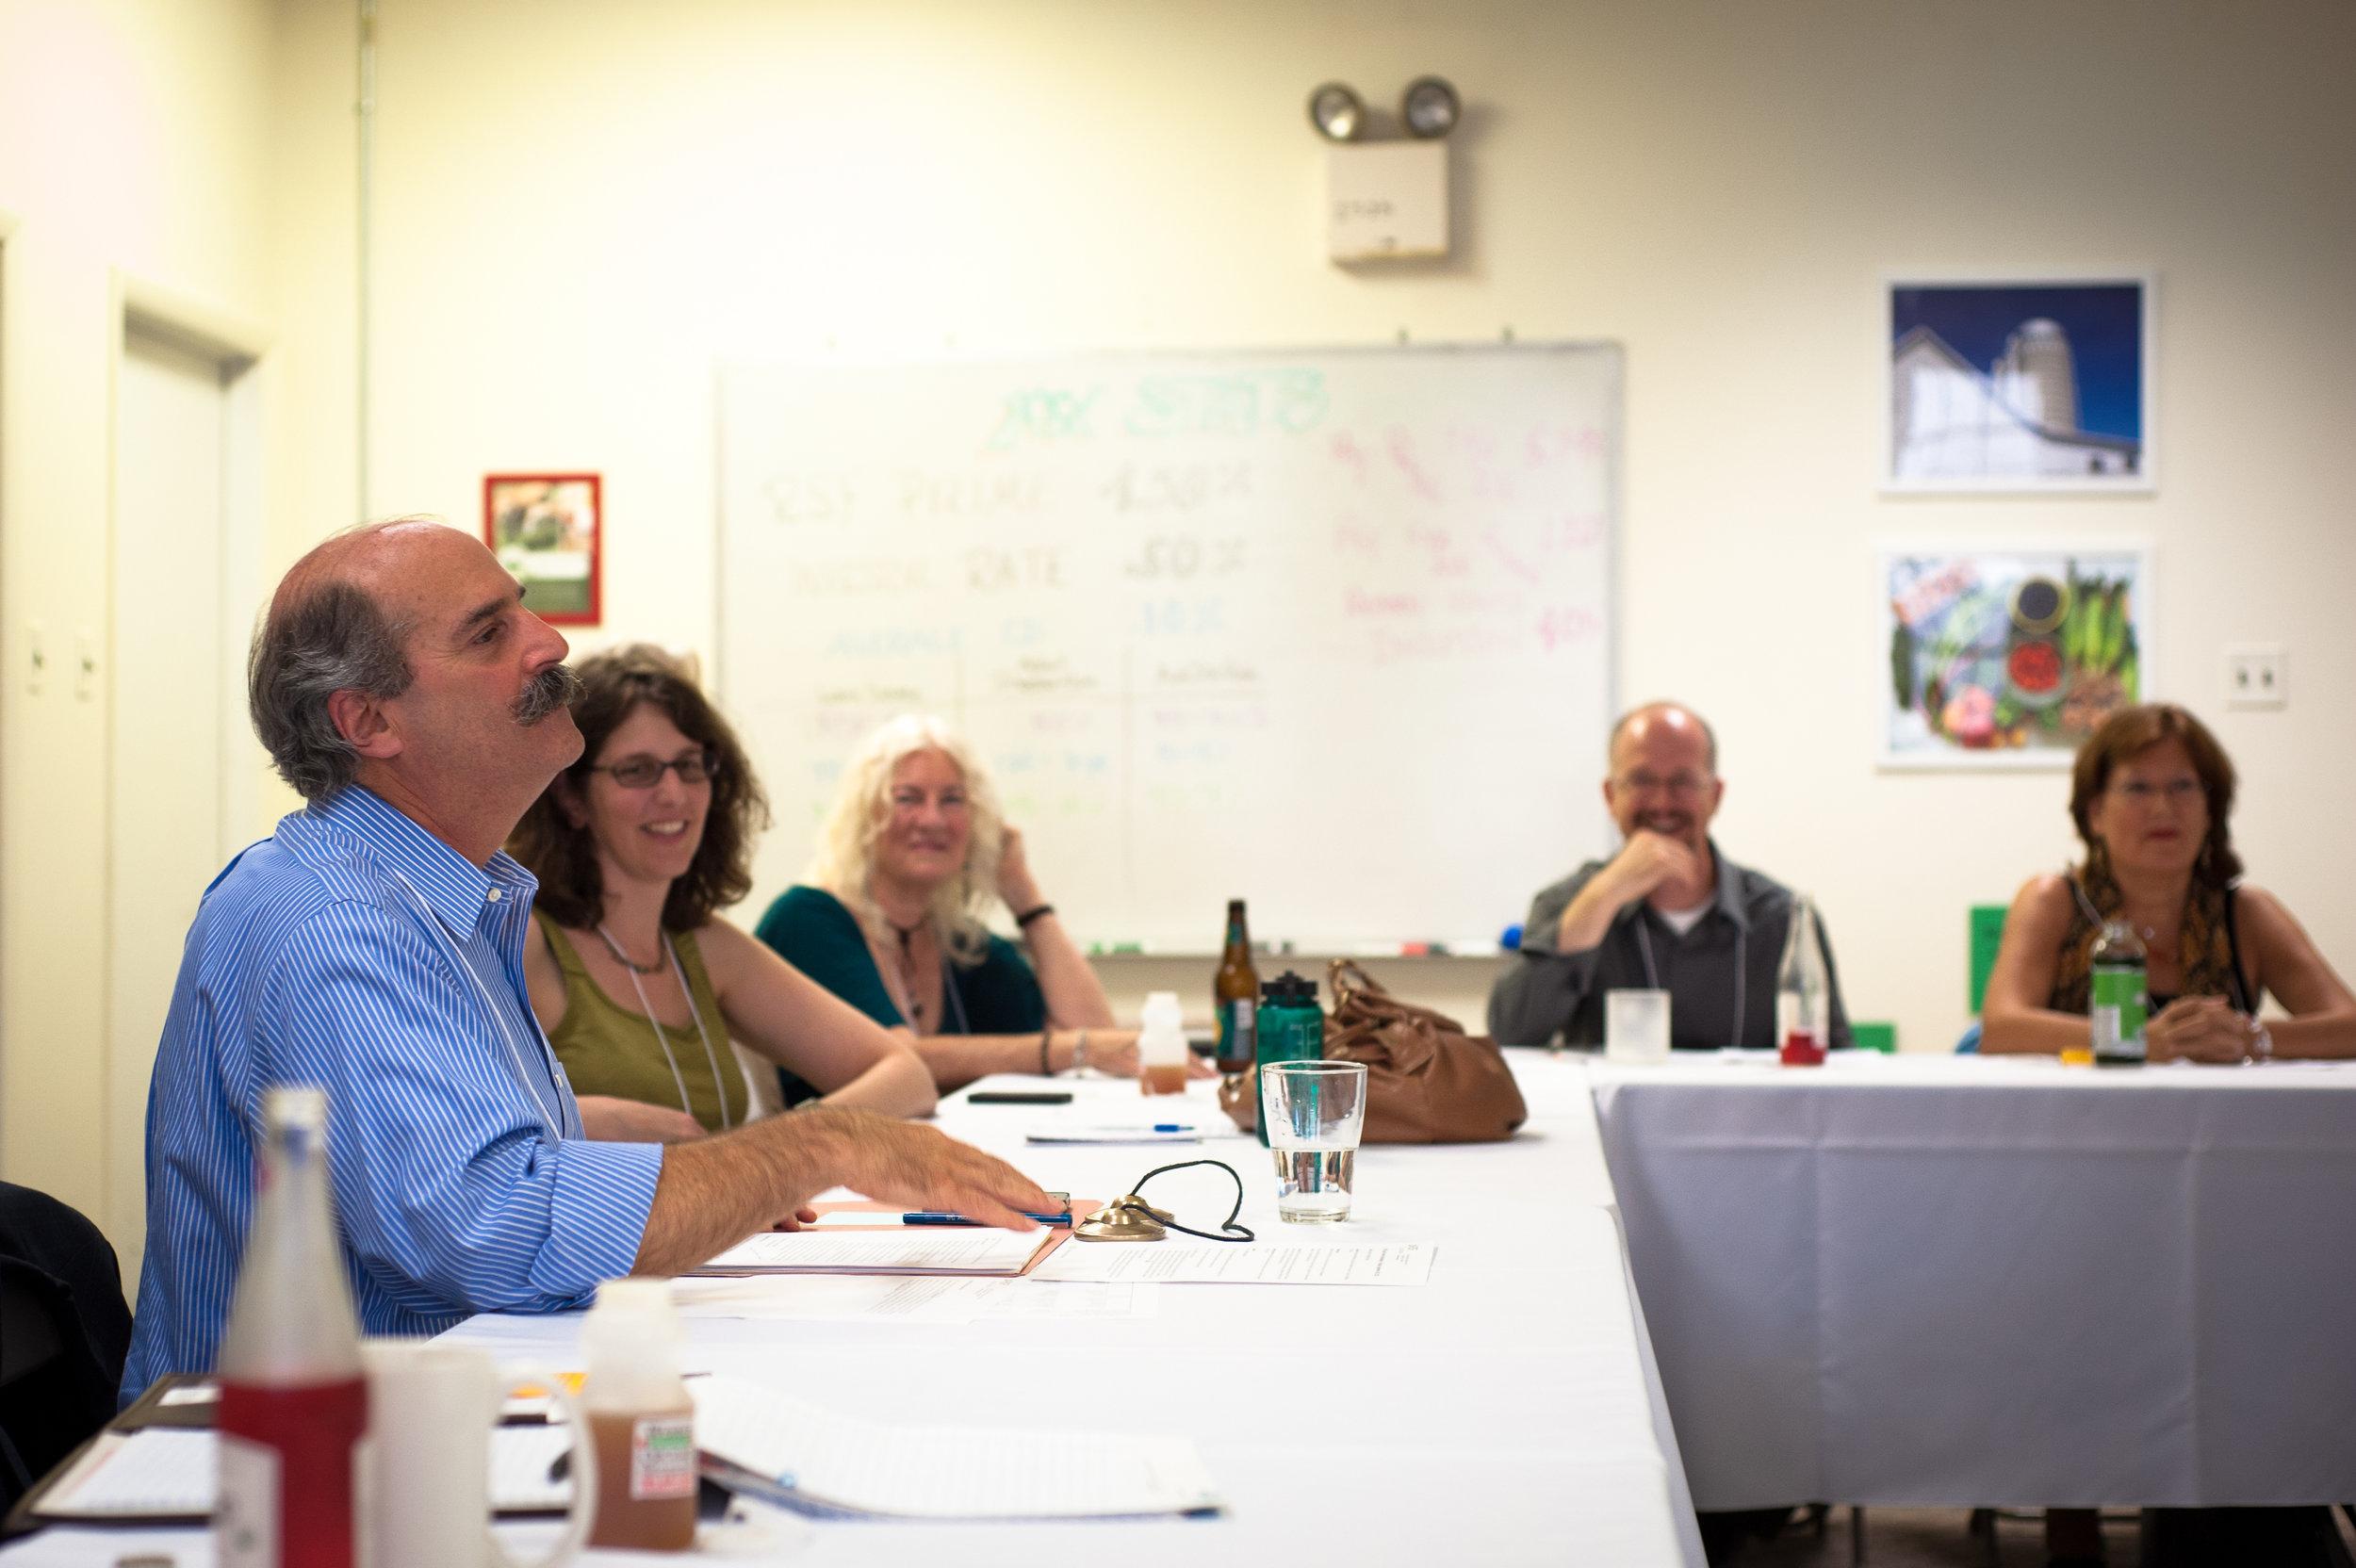 John Bloom facilitates a pricing meeting